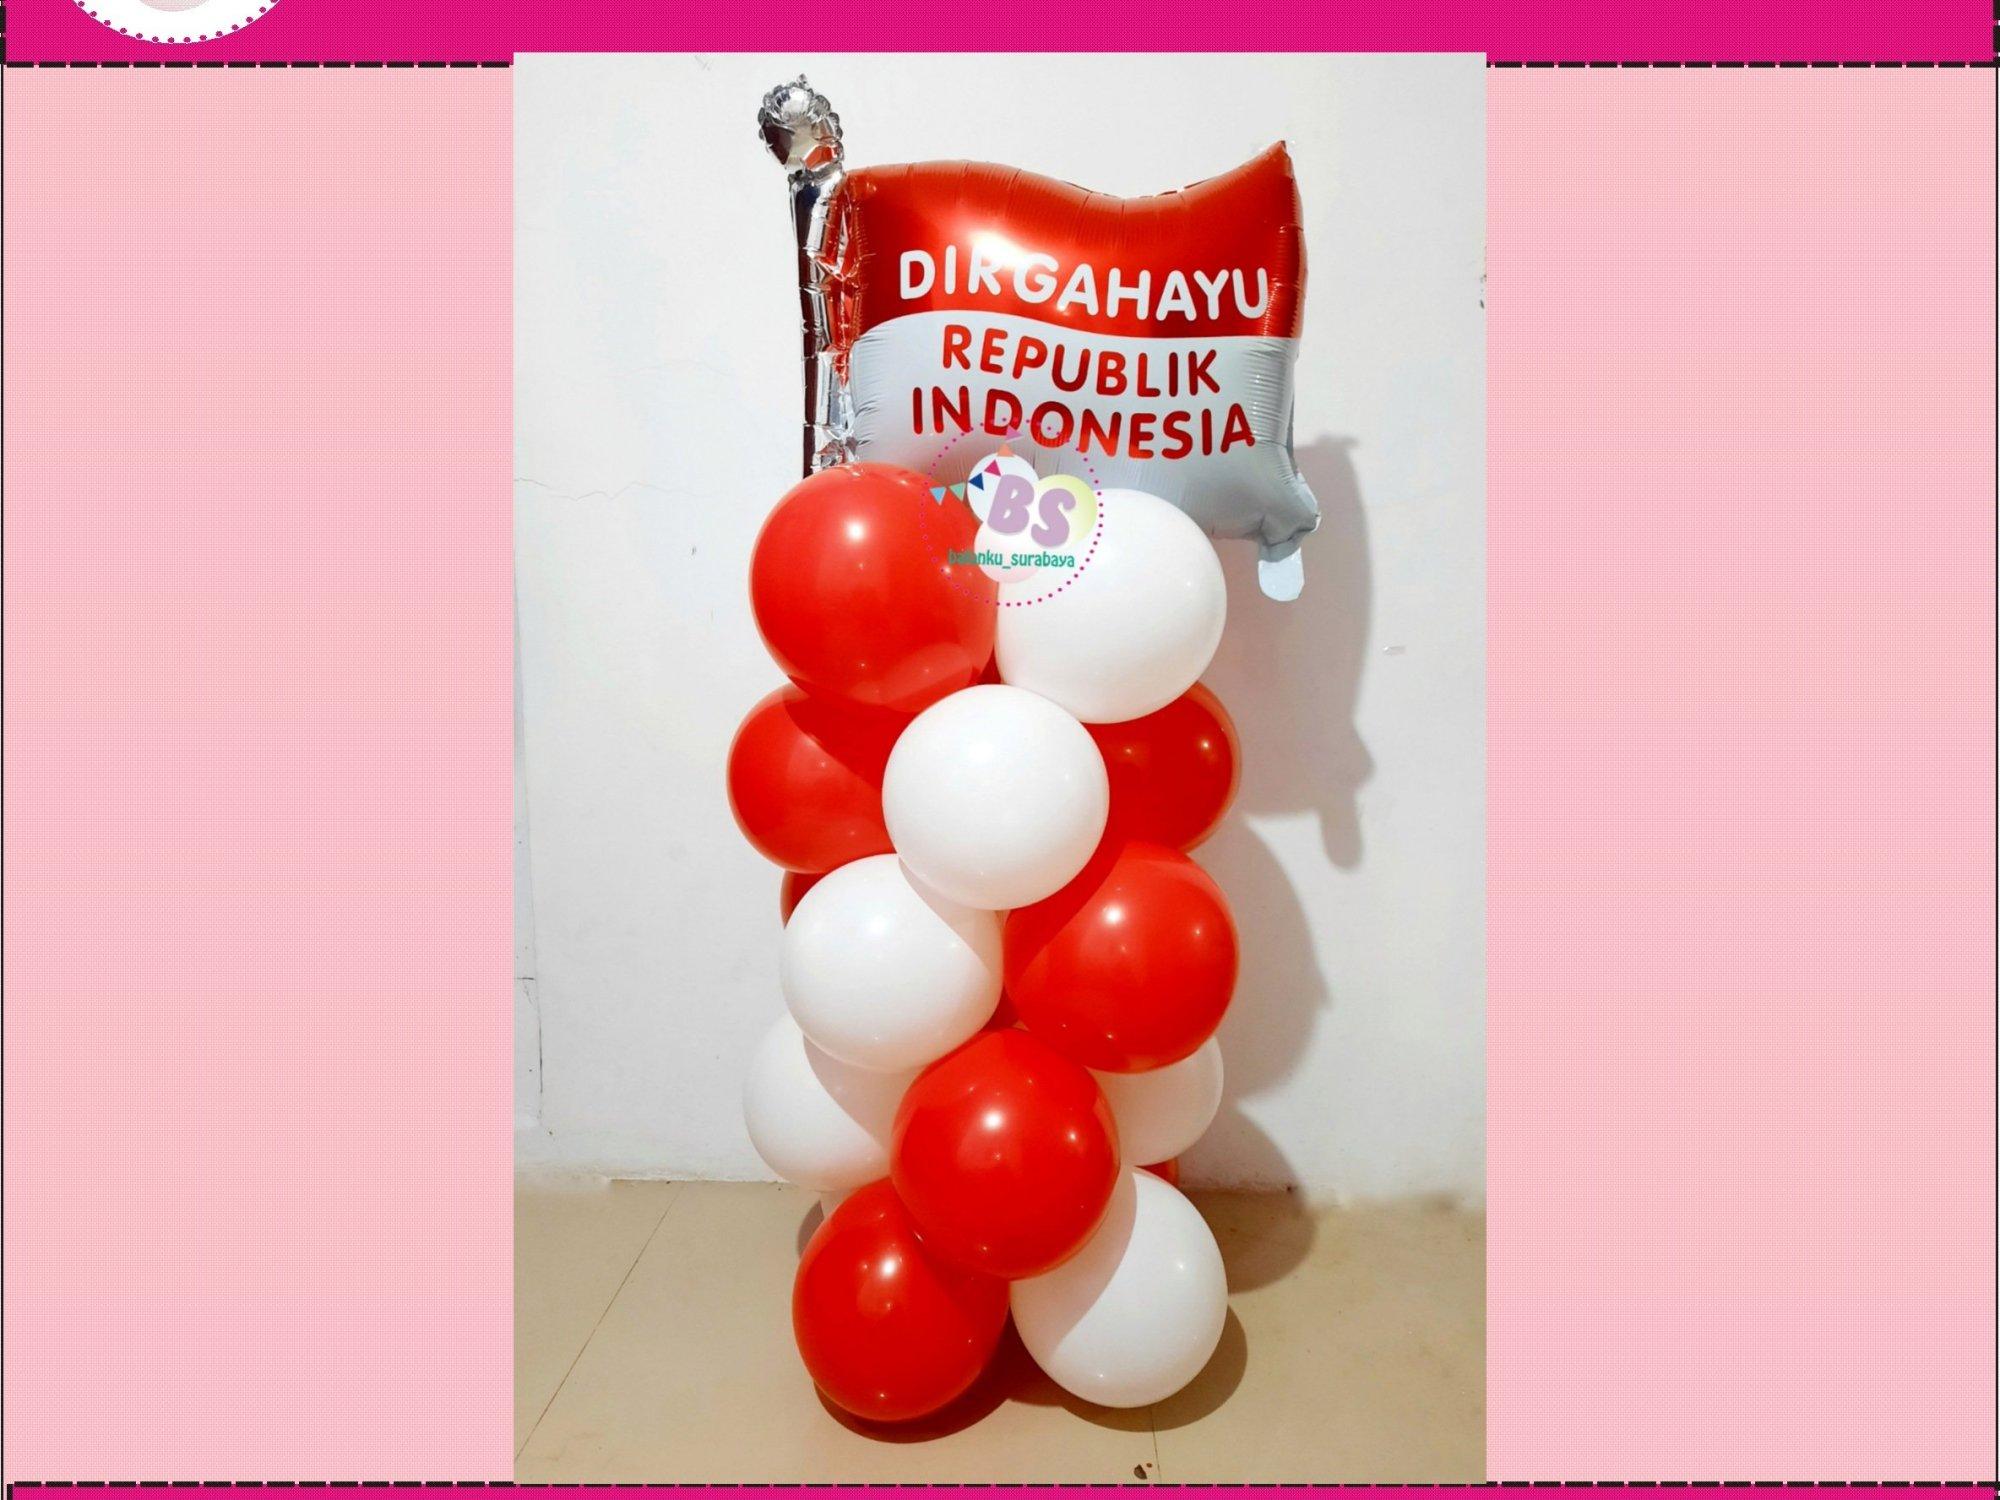 standing balon dirgahayu indonesia, balon dirgahayu indonesia love, balon dirgahayu indonesia bulat, tulisan dinding dirgahayu indonesia, garland balon, parcel balon ucapan, parcel balon ucapan, parcel balon ucapan warna pink, balon bentuk bunga, standing balon custom, balon ucapan ulang tahun anak, balon ucapan ulang tahun warna merah, balon ucapan ulang tahun merah, balon ucapan ulang tahun anak balon ucapan warna peach, baln ucapan box coklat, jual balon latex twist hijau emerald, BAlon Gas,Bunga dekorasi,Rangkaian bunga artificial, Buket bunga, buket bunga mawar, harga buket bunga,Balon sablon, balon Printing, balon promosi, Perlengkapan ulang tahun, Balon latex , balon doff, balon natal, balon agustusan, balon dekorasi, balonku Surabaya, 085733133529